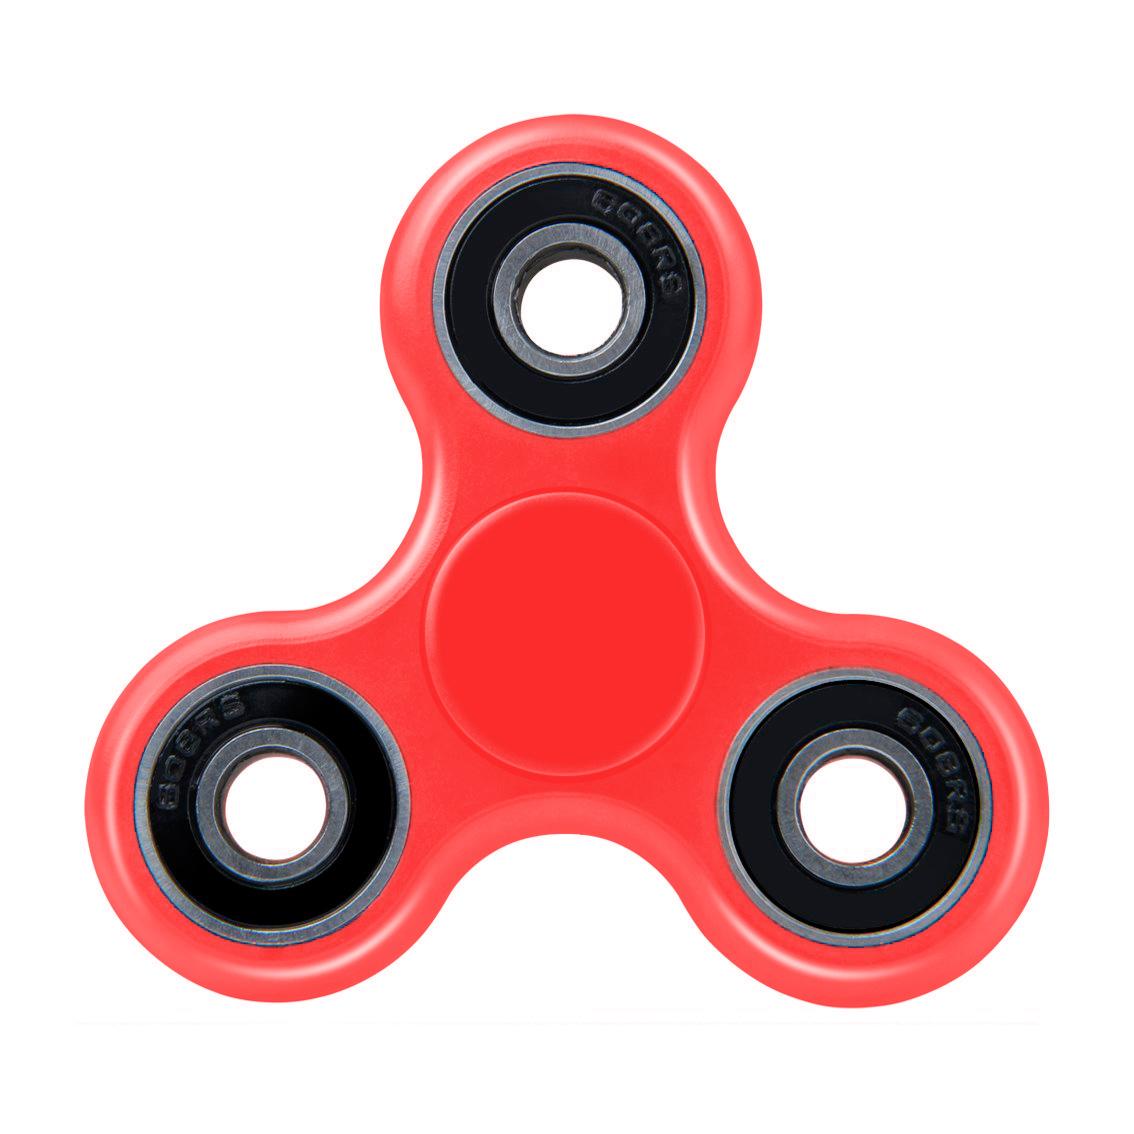 spinner fidget finger anti stress cadeau autisme edc adhs jeu roulement ebay. Black Bedroom Furniture Sets. Home Design Ideas